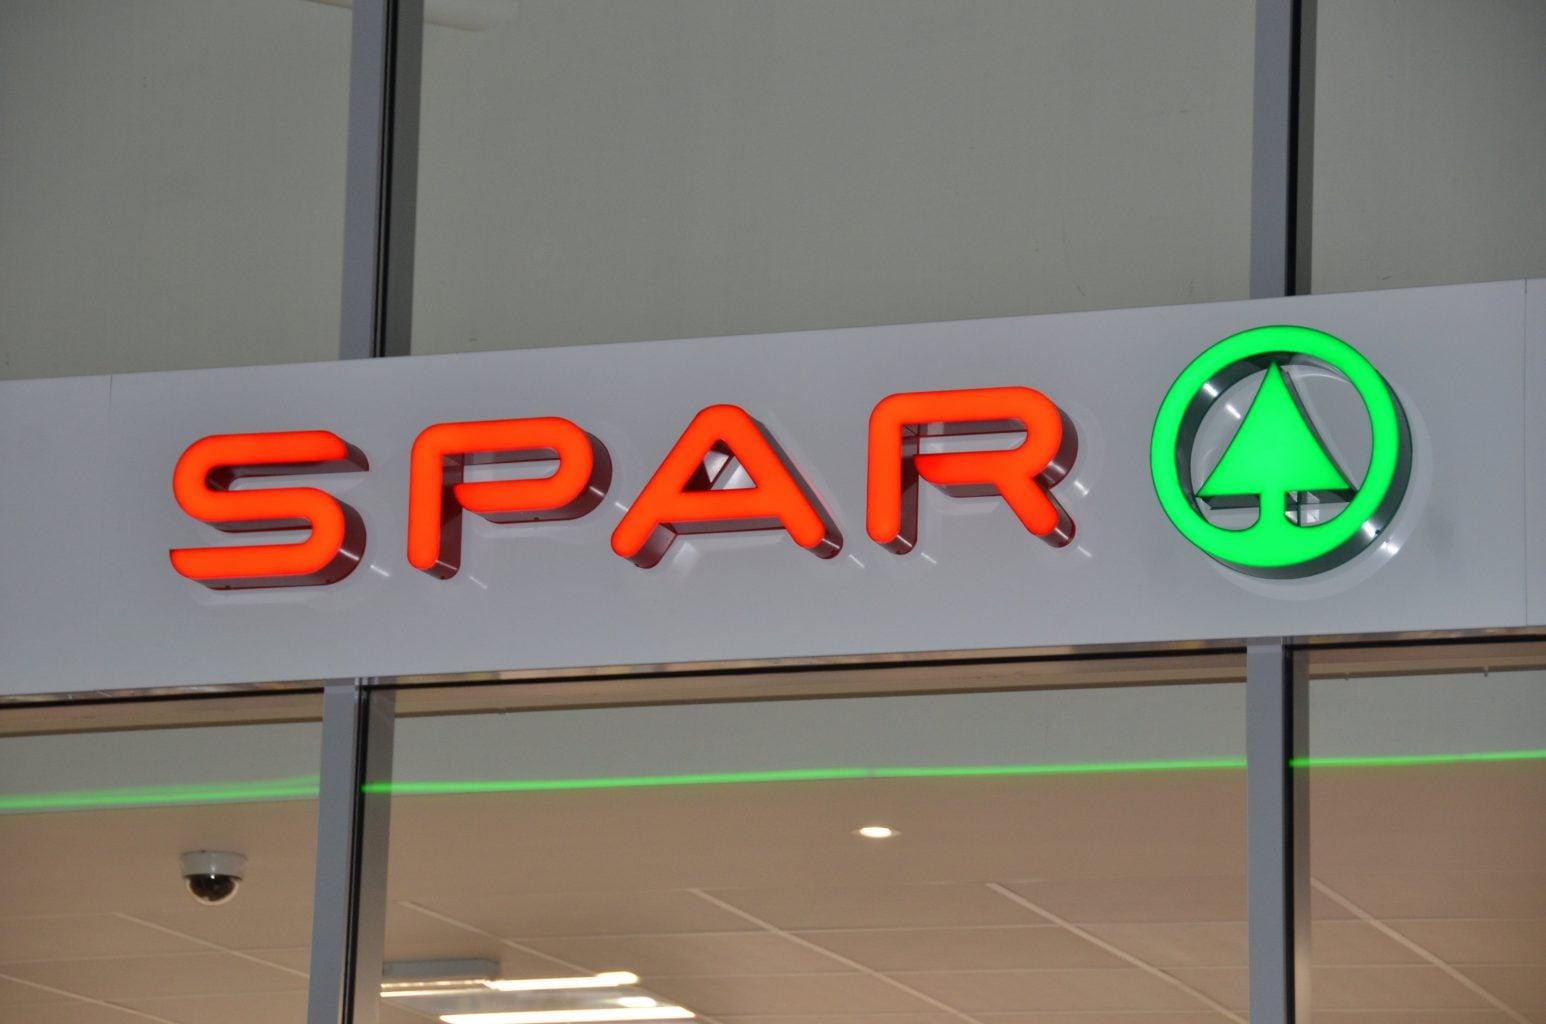 Spar built up LED illuminated retail grocery sign